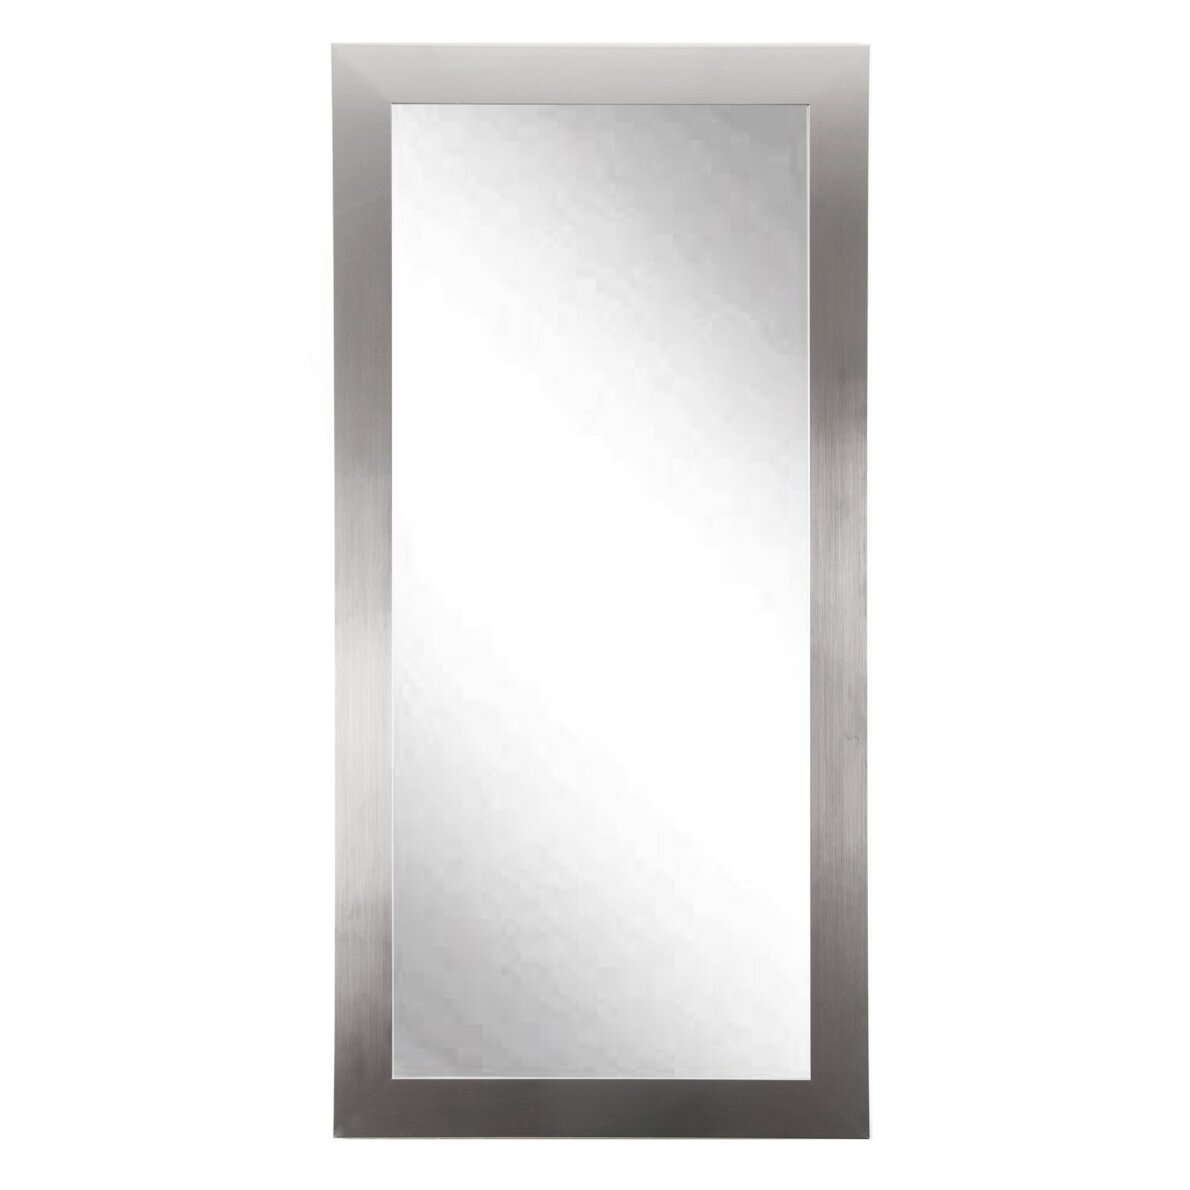 Brandtworksllc ultra modern wall mirror reviews wayfair for Contemporary wall mirrors